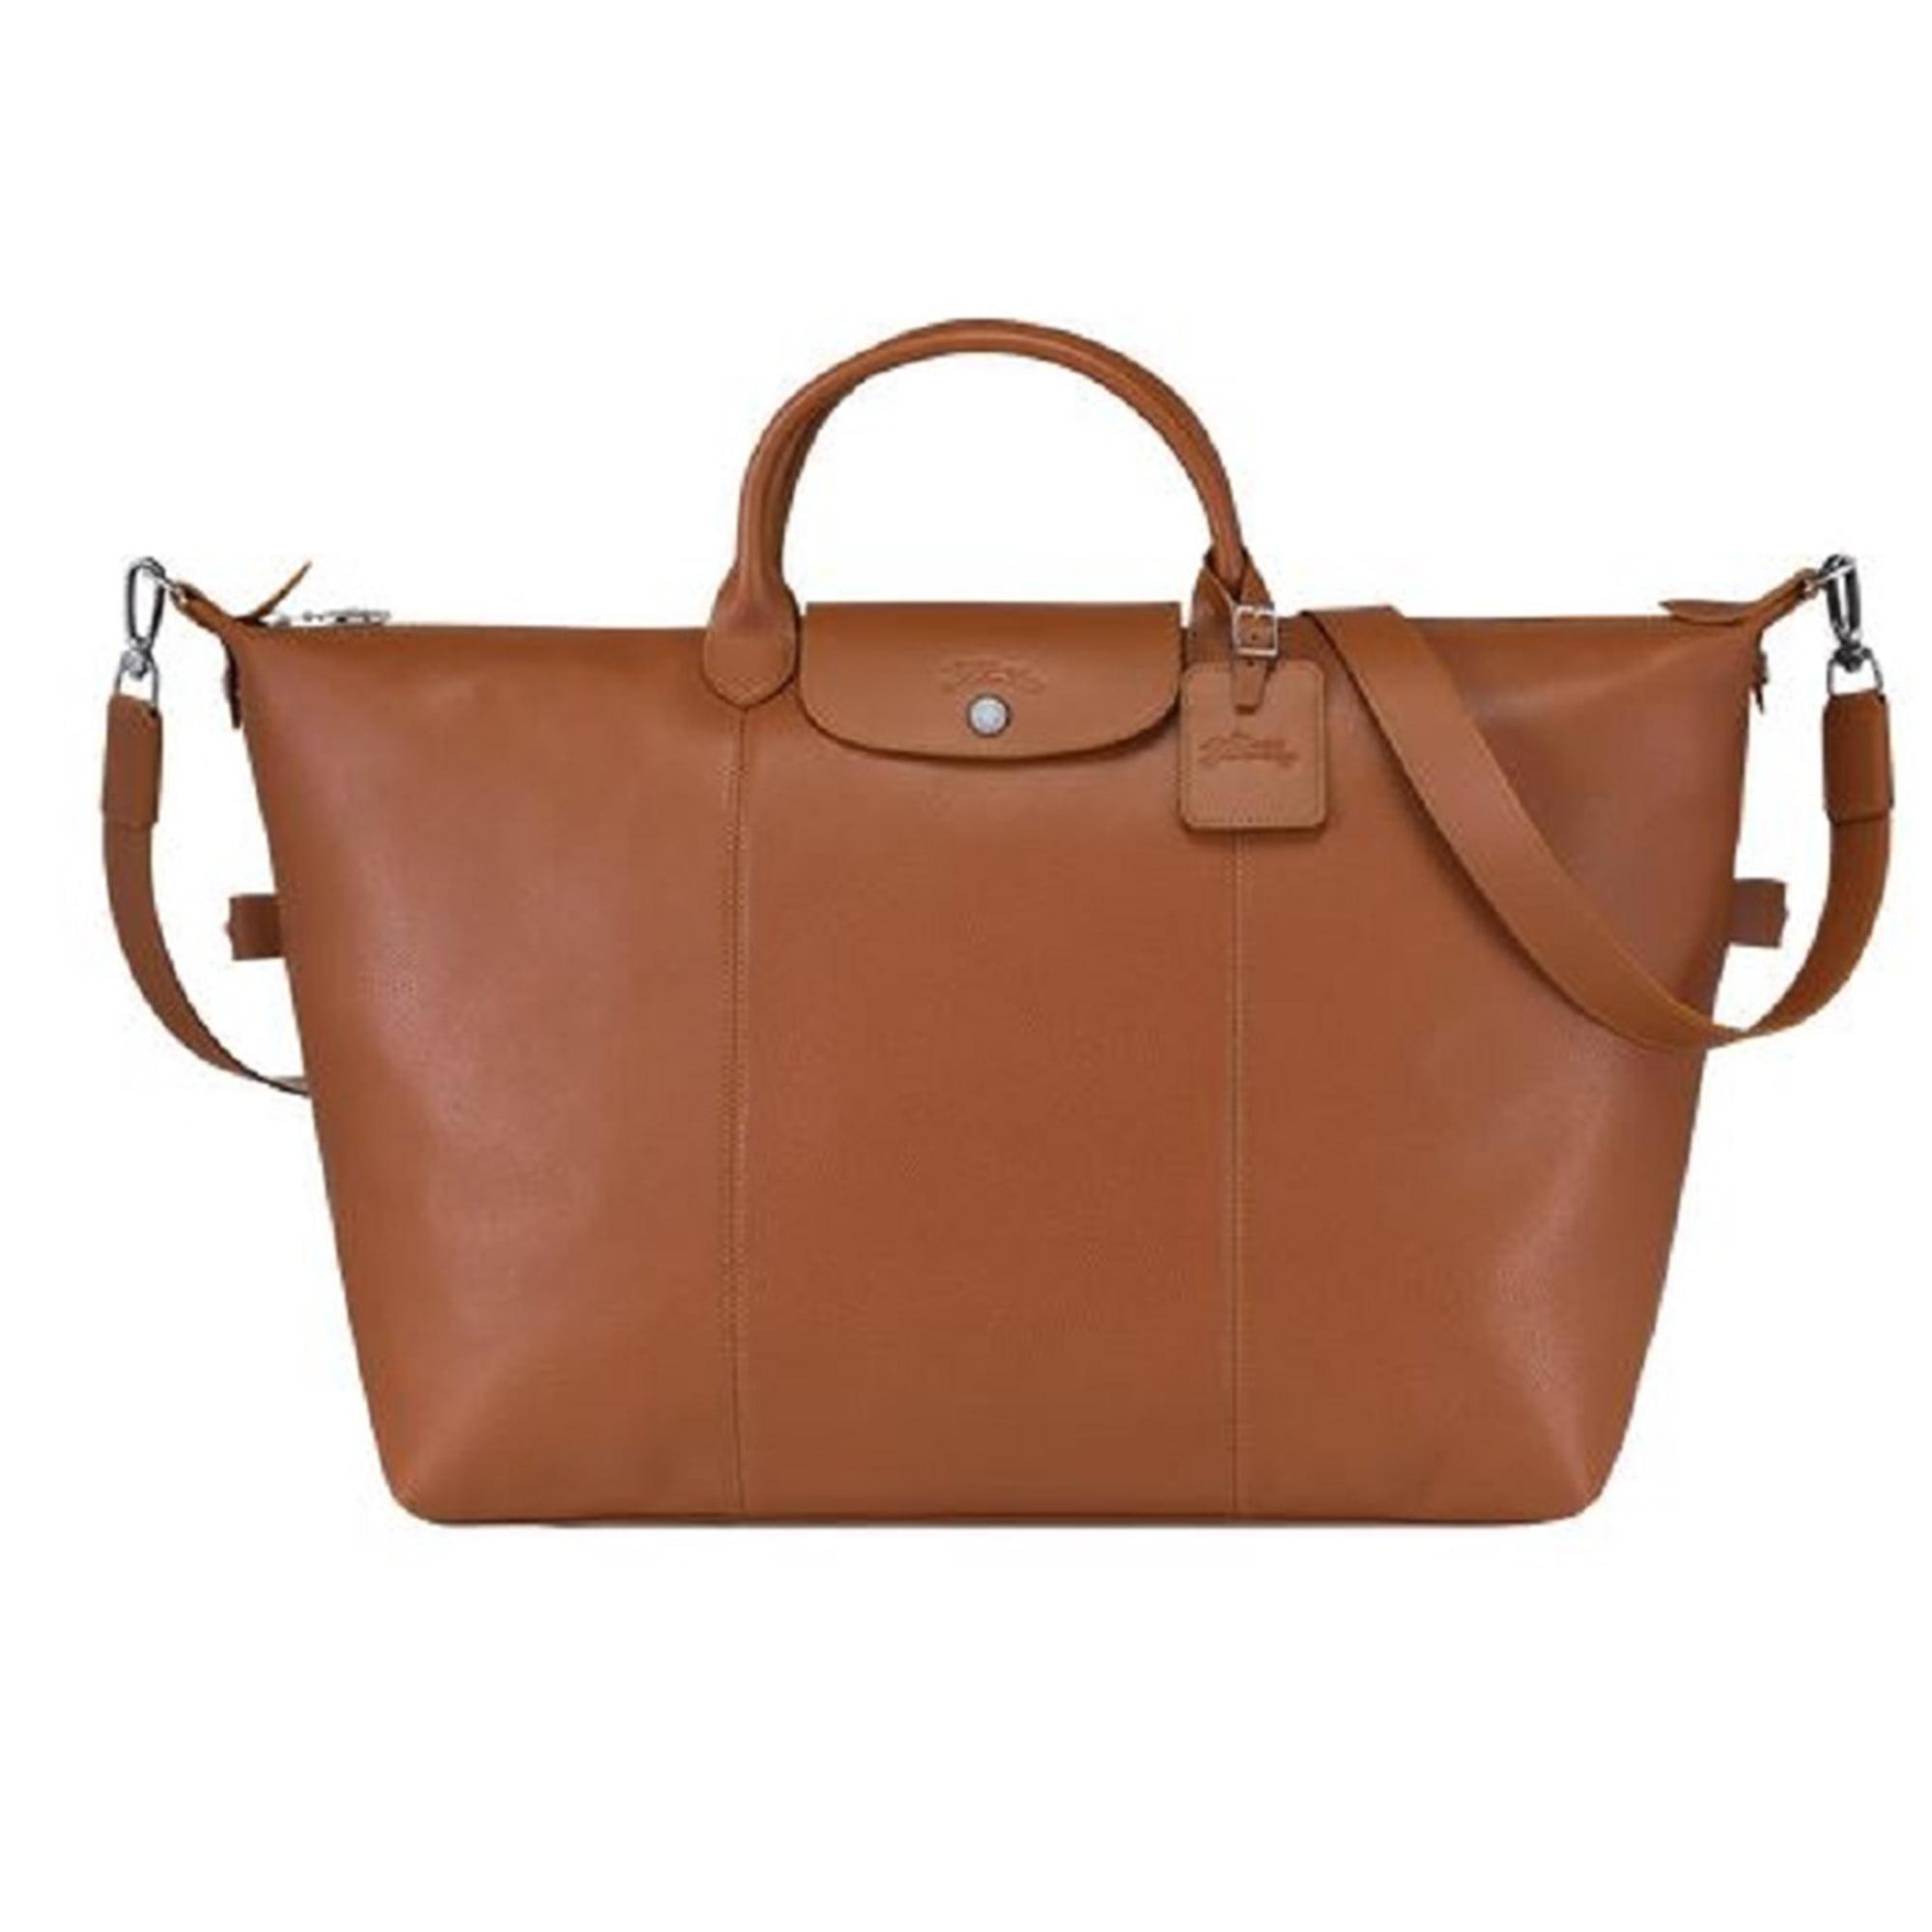 LongChamp Le Foulonne Travel Bag Large Duffel Overnight Handbag -  Walmart.com